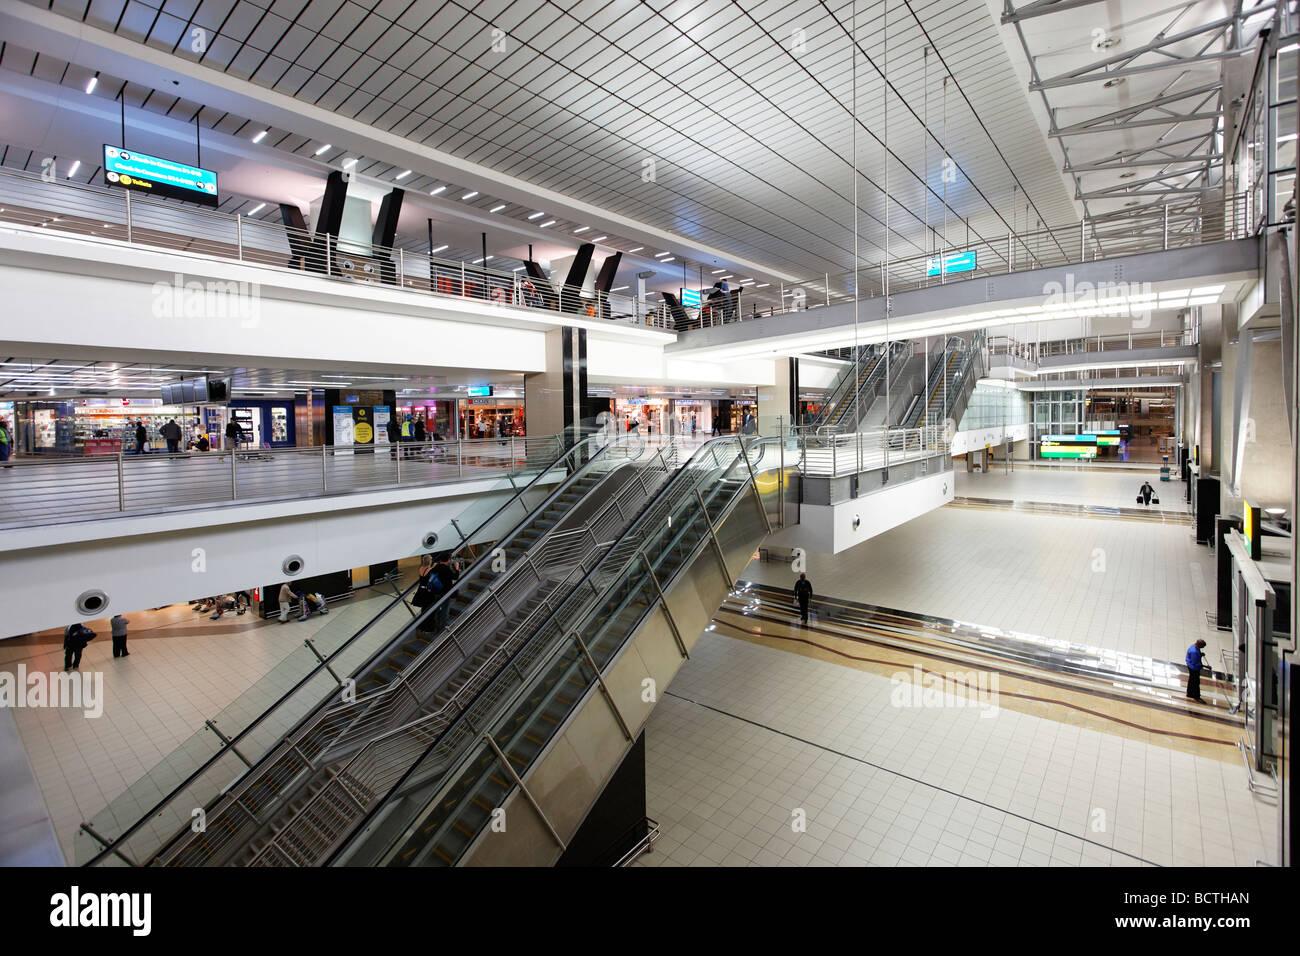 Escalator, departure, hall, O R Tambo International Airport, Johannesburg, South Africa, Africa - Stock Image